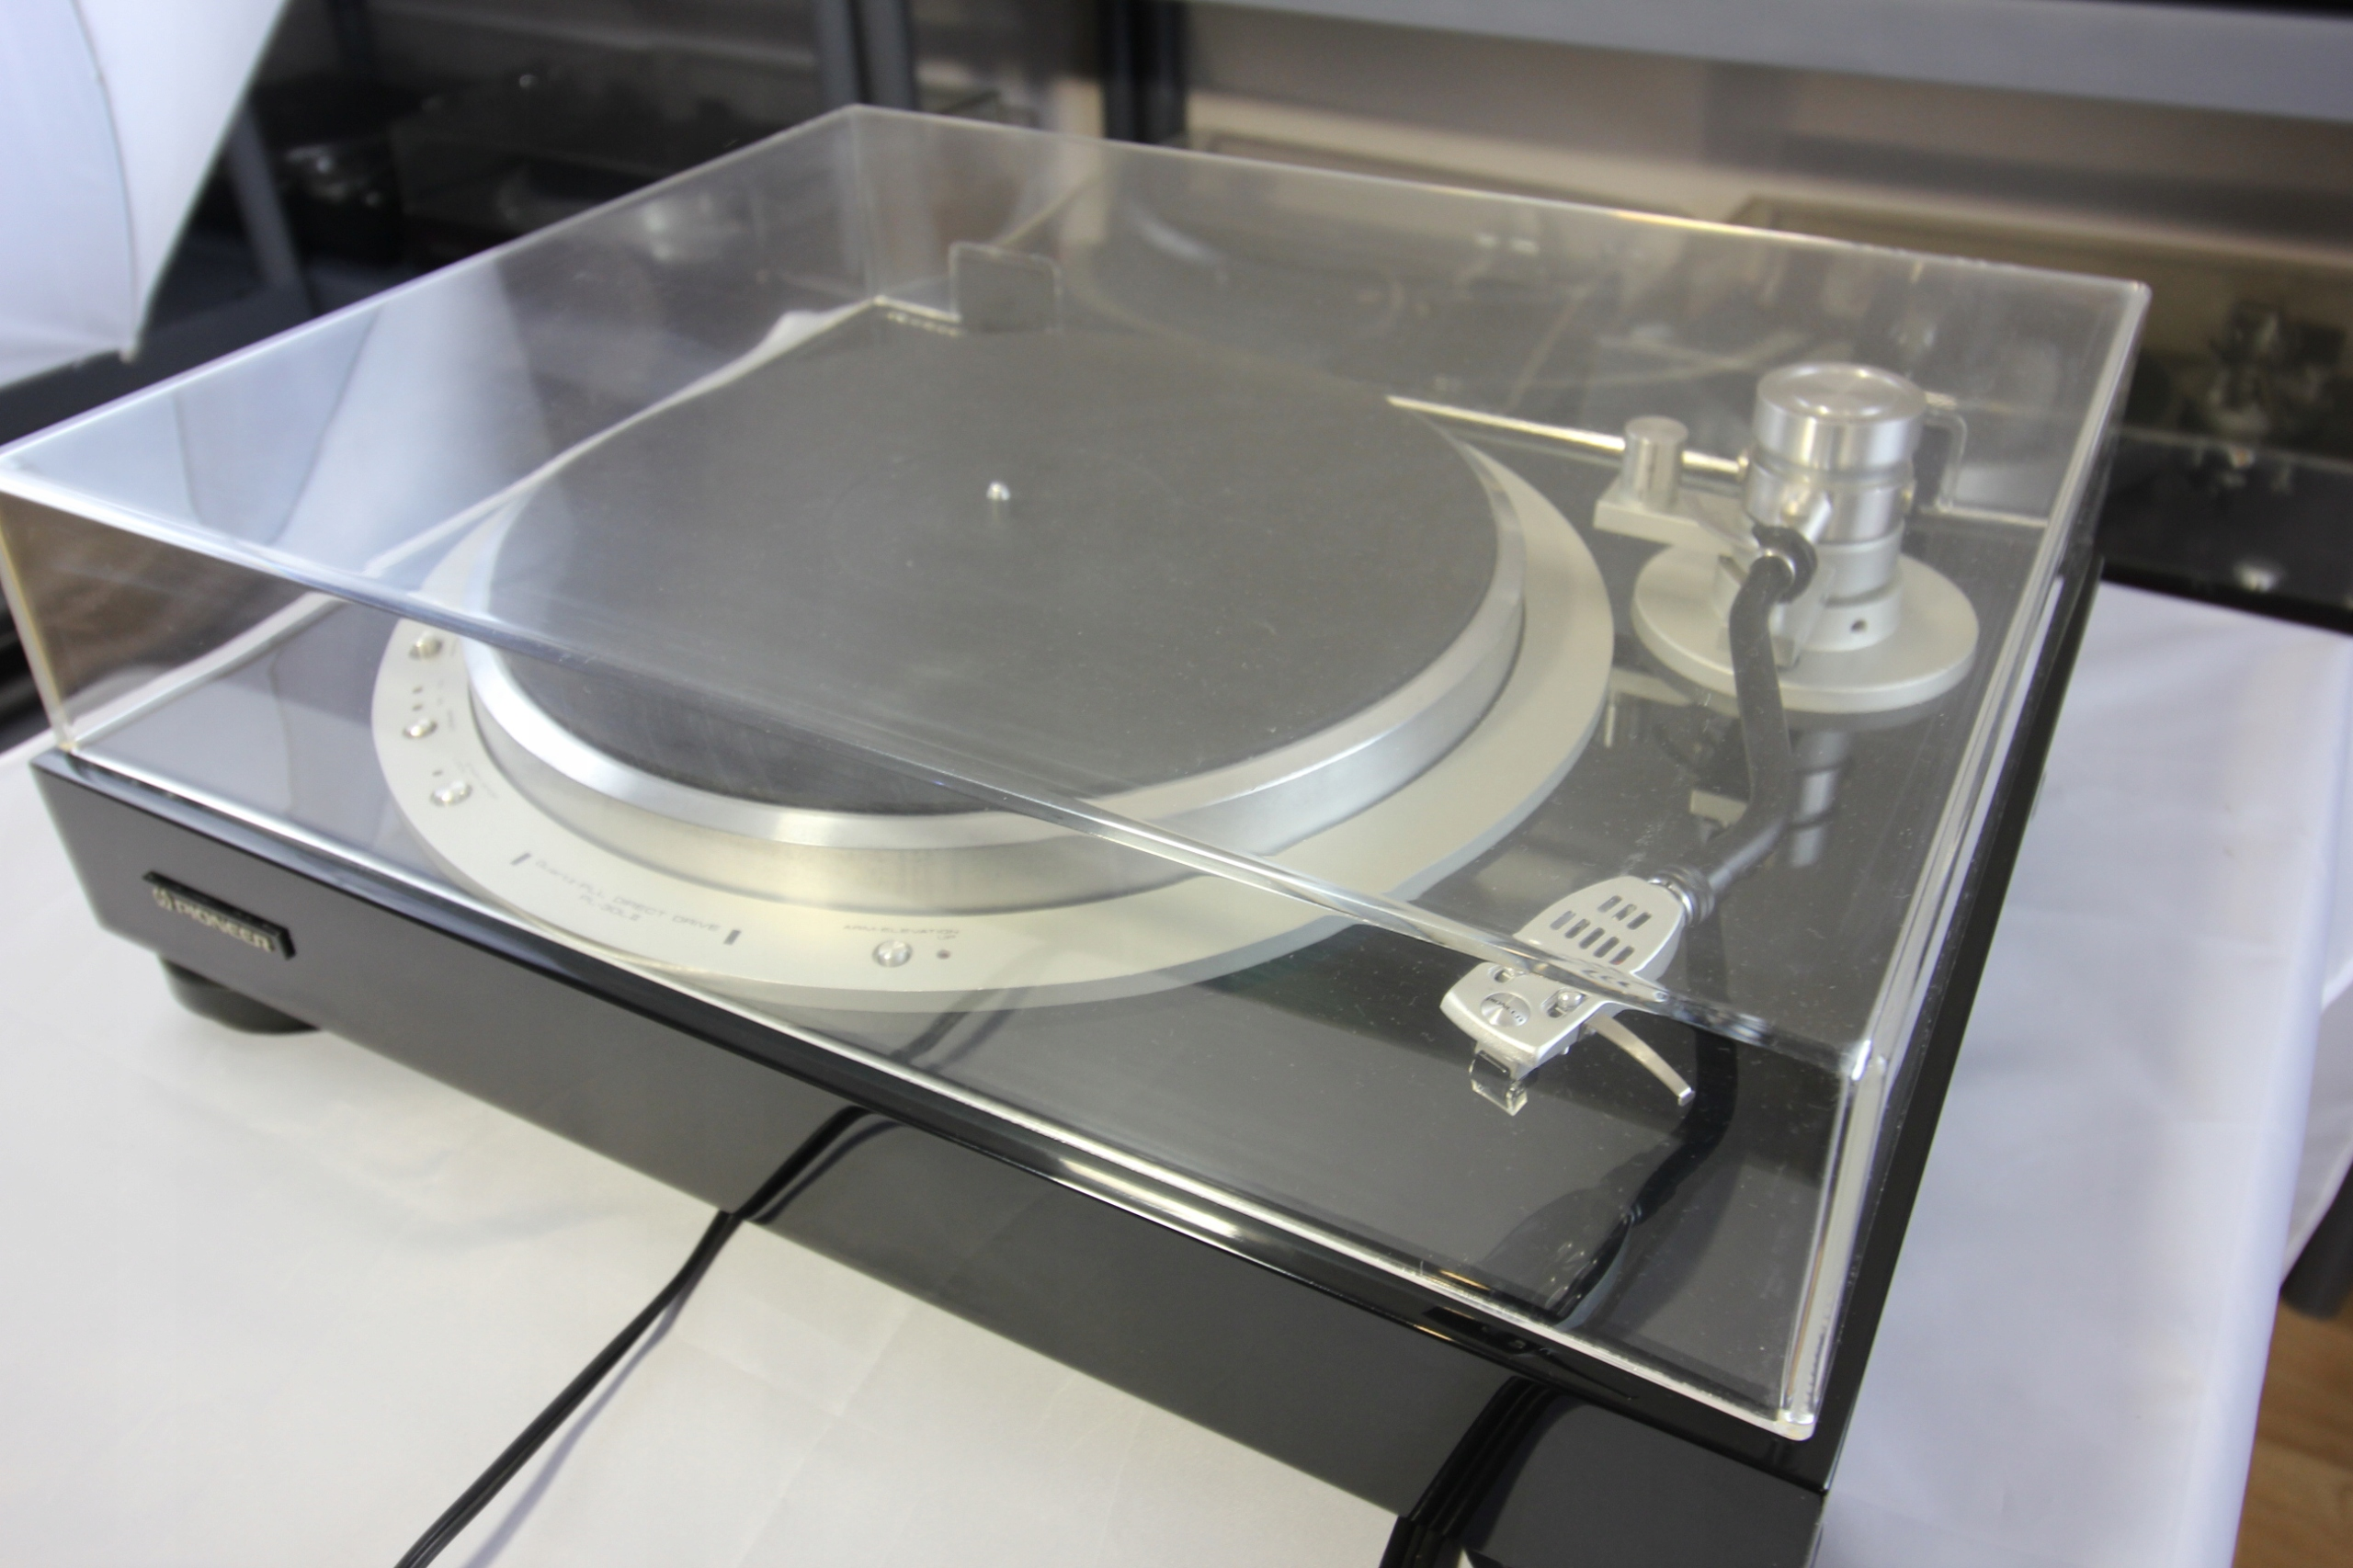 Gramofon Pioneer PL 30L II, pianolack, idealny.